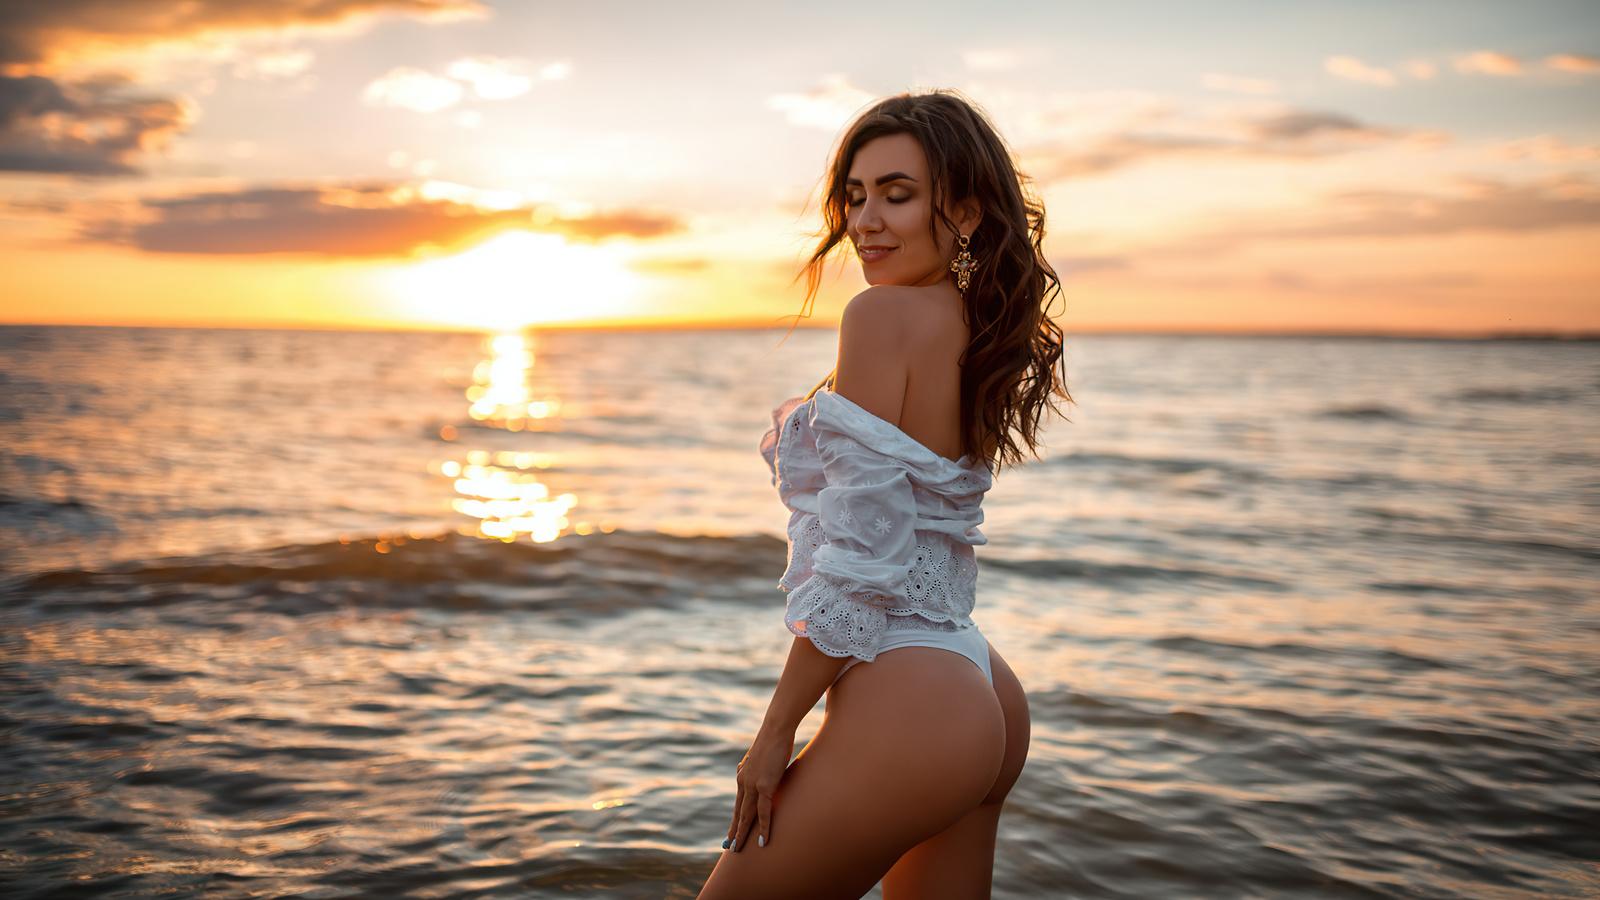 women, brunette, sunset, beach, sea, women outdoors, closed eyes, ass, white clothing, smiling